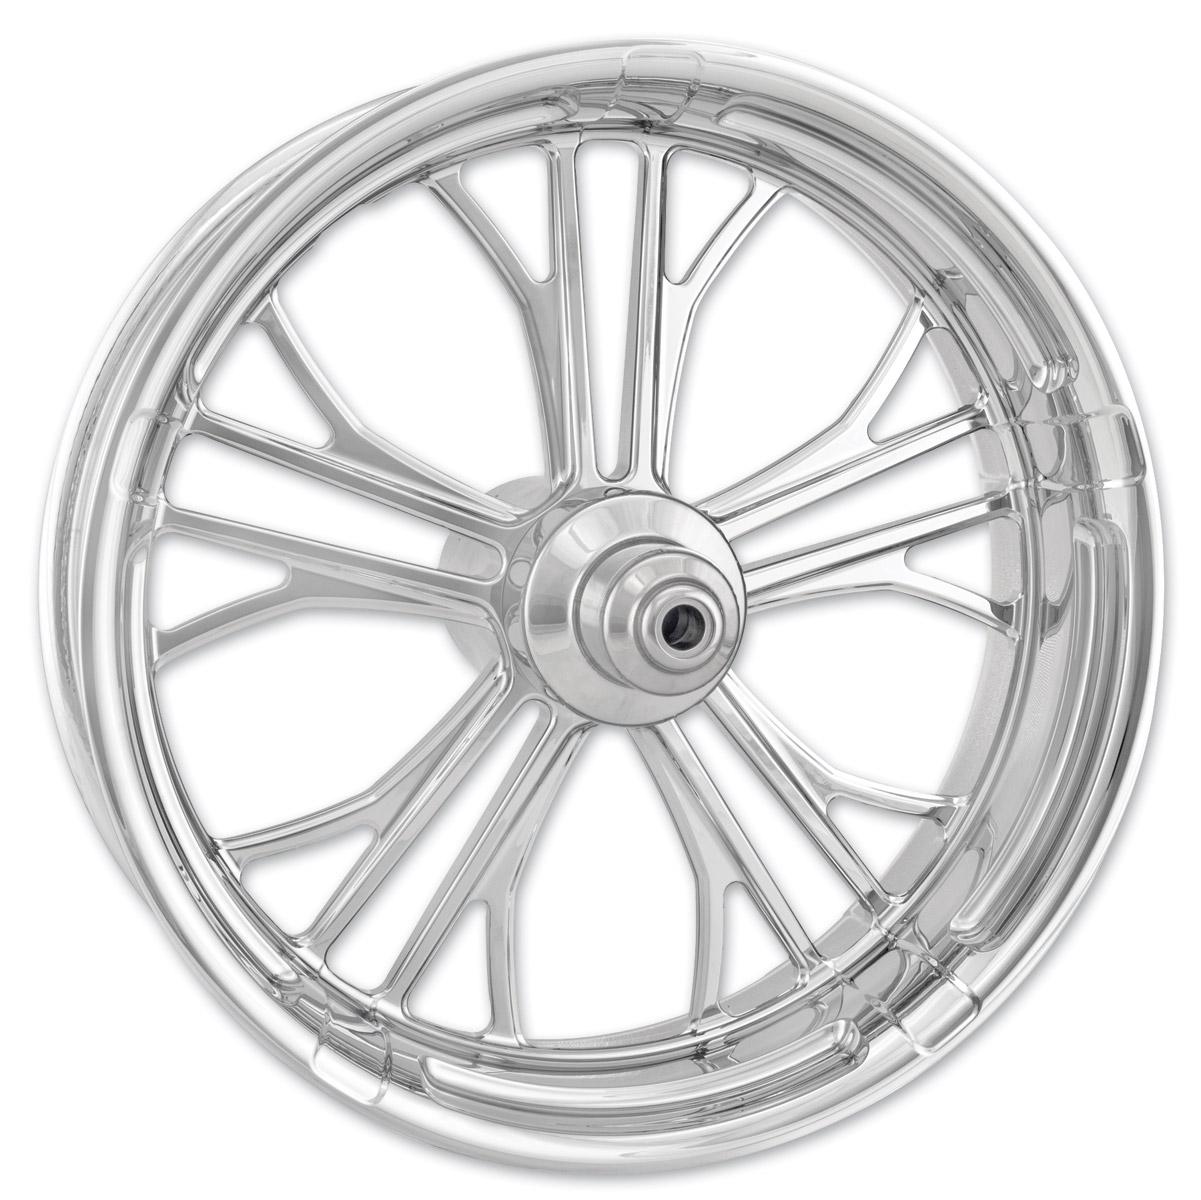 Performance Machine Chrome Forged Dixon Front Wheel, 18